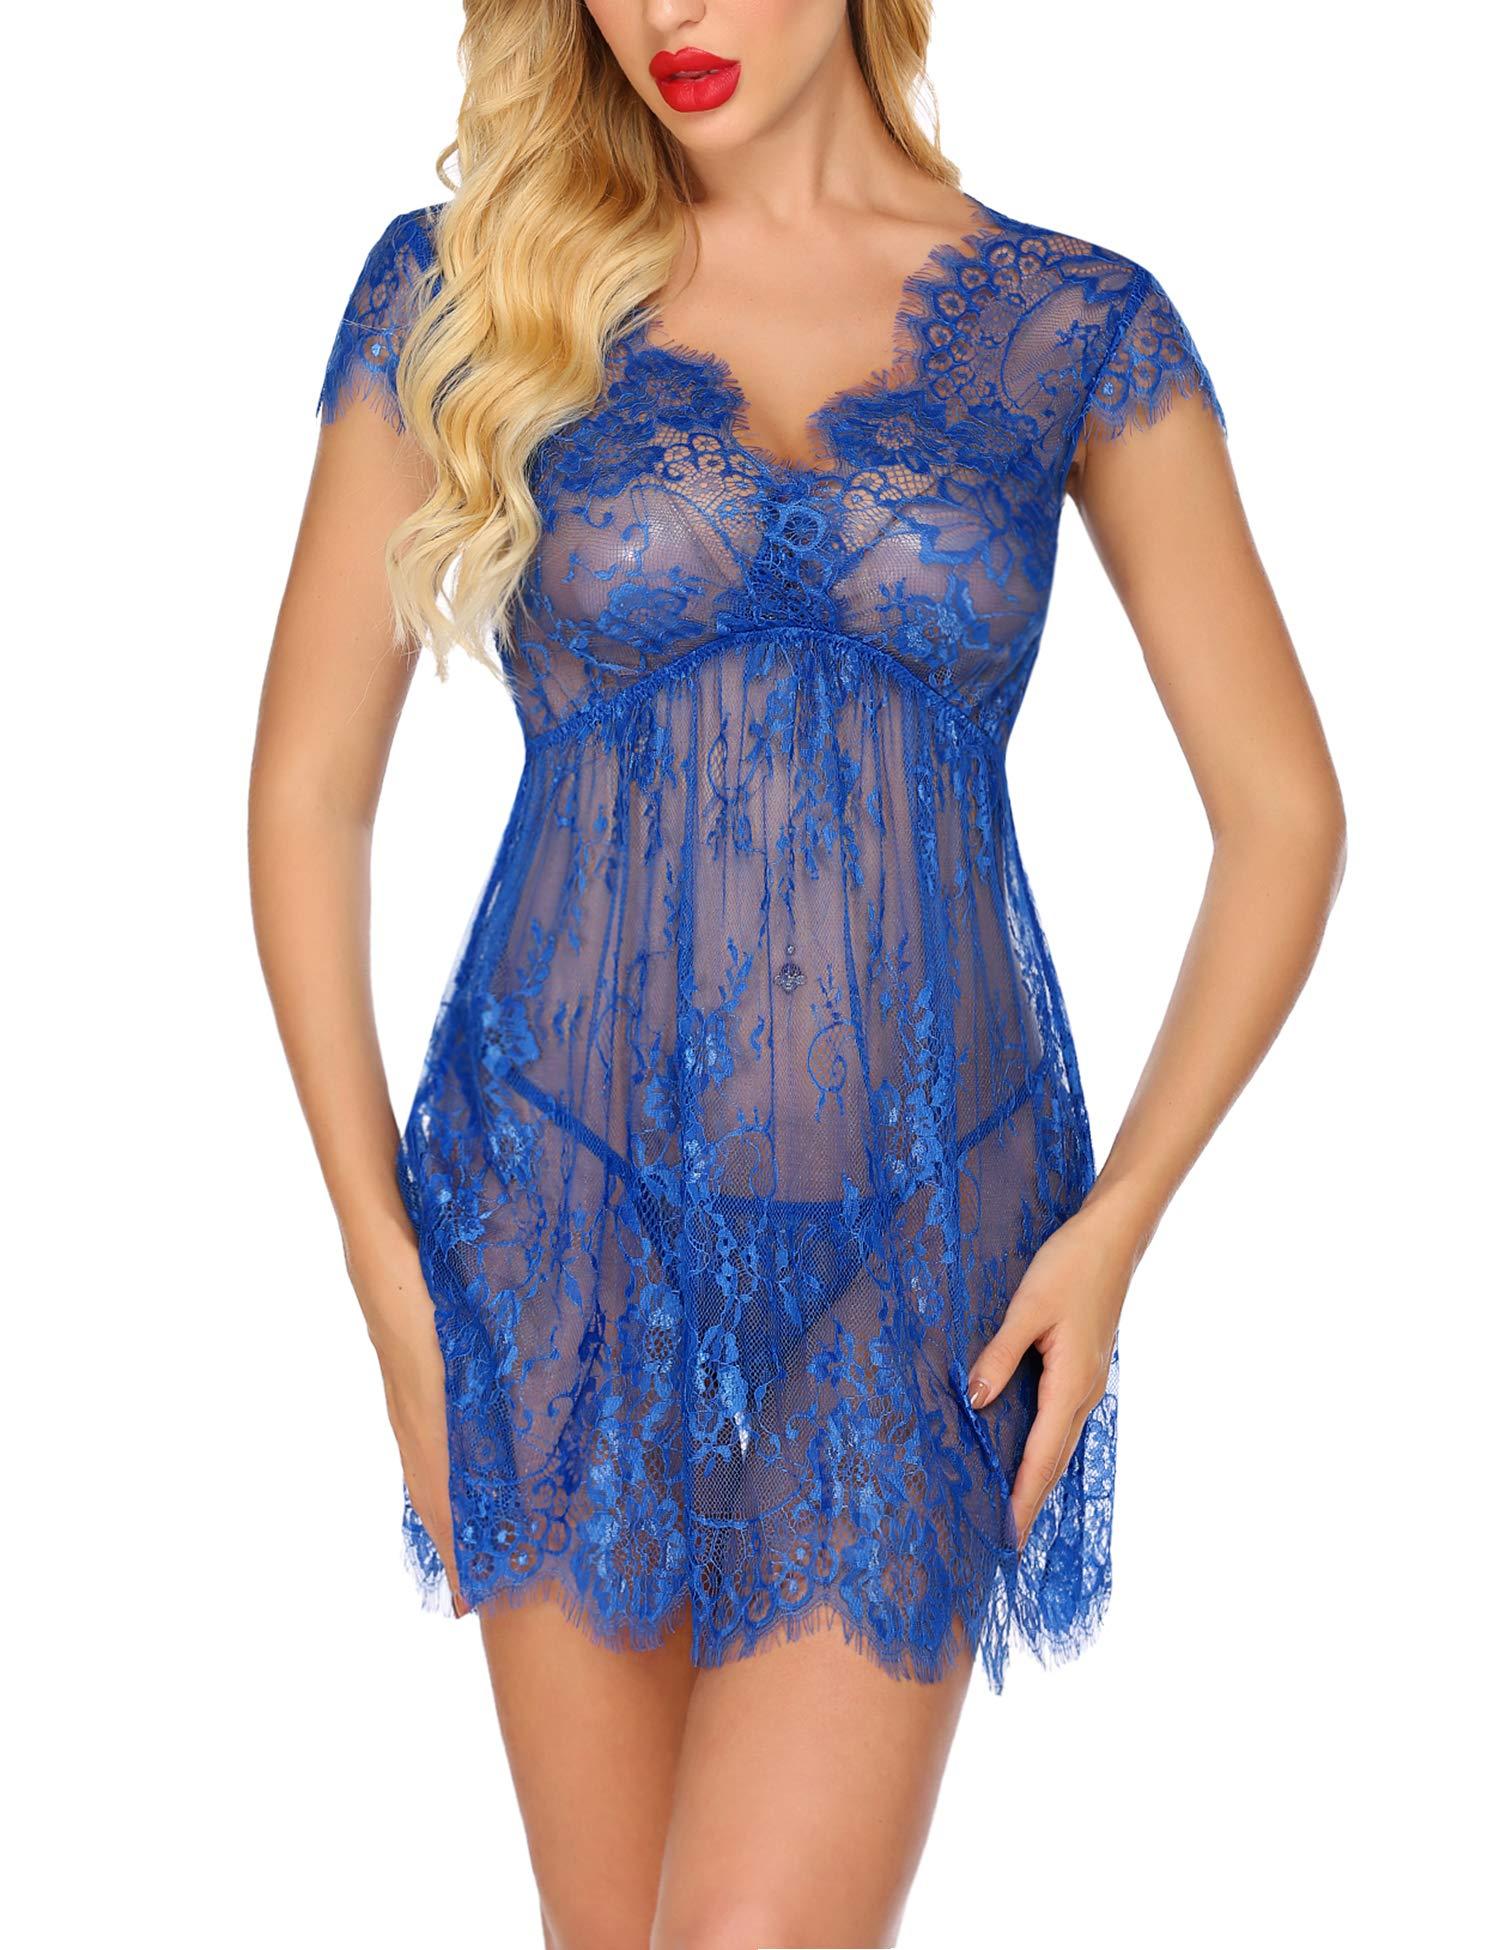 Avidlove Women Sexy Babydoll Lingerie Eyelash Mini Lace Chemise Nightwear Set